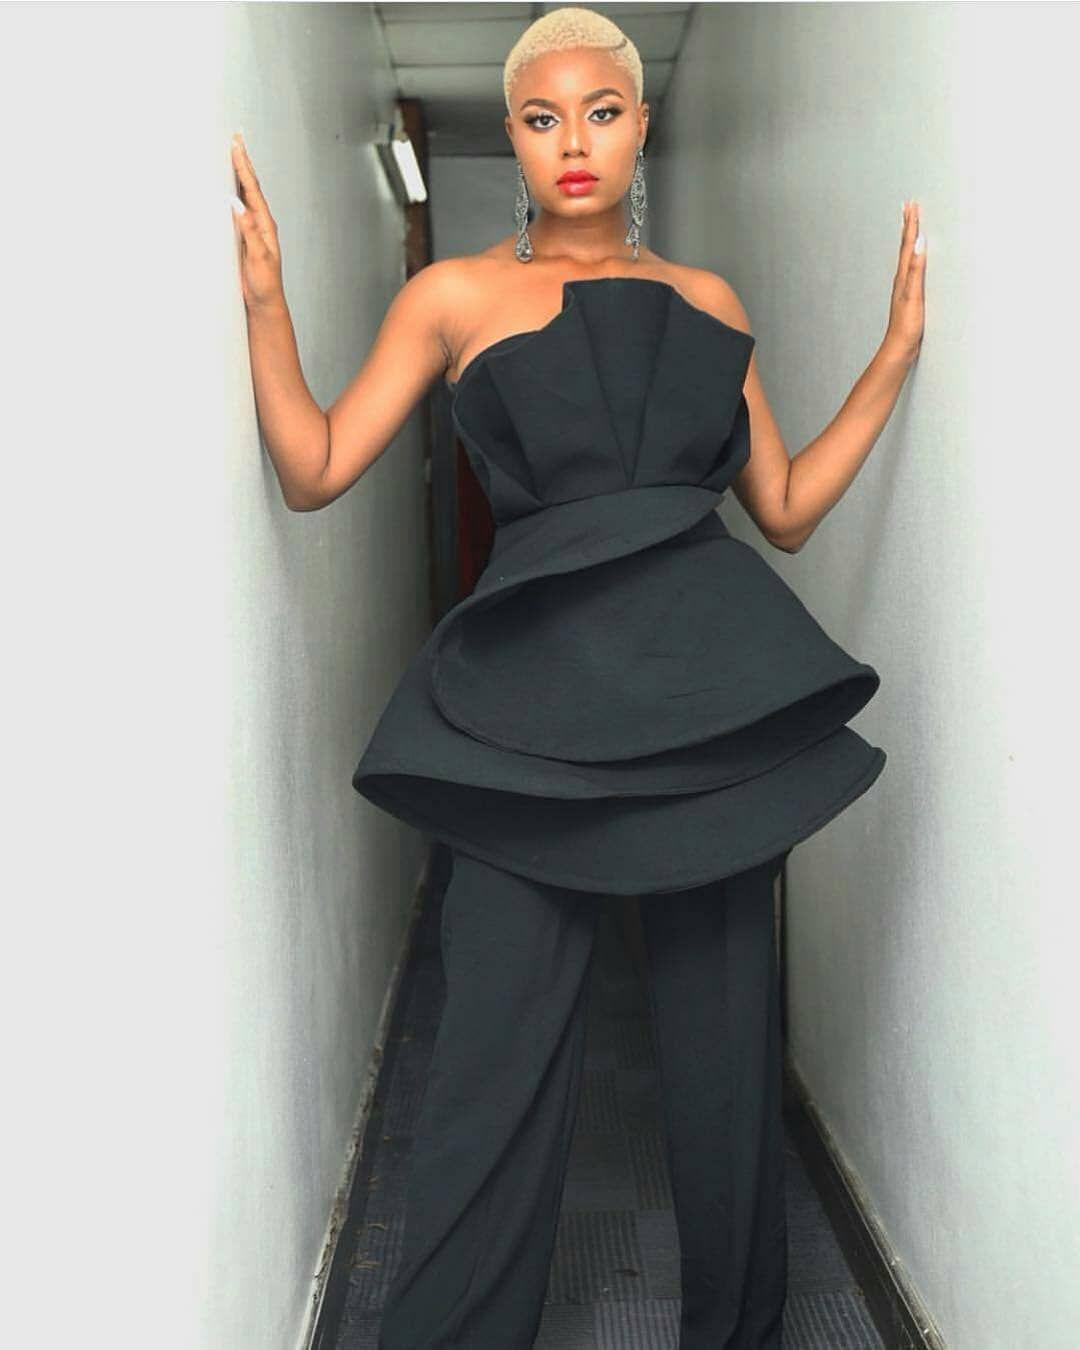 Pin by Charlene on Fashion Divas | Fashion, Diva fashion